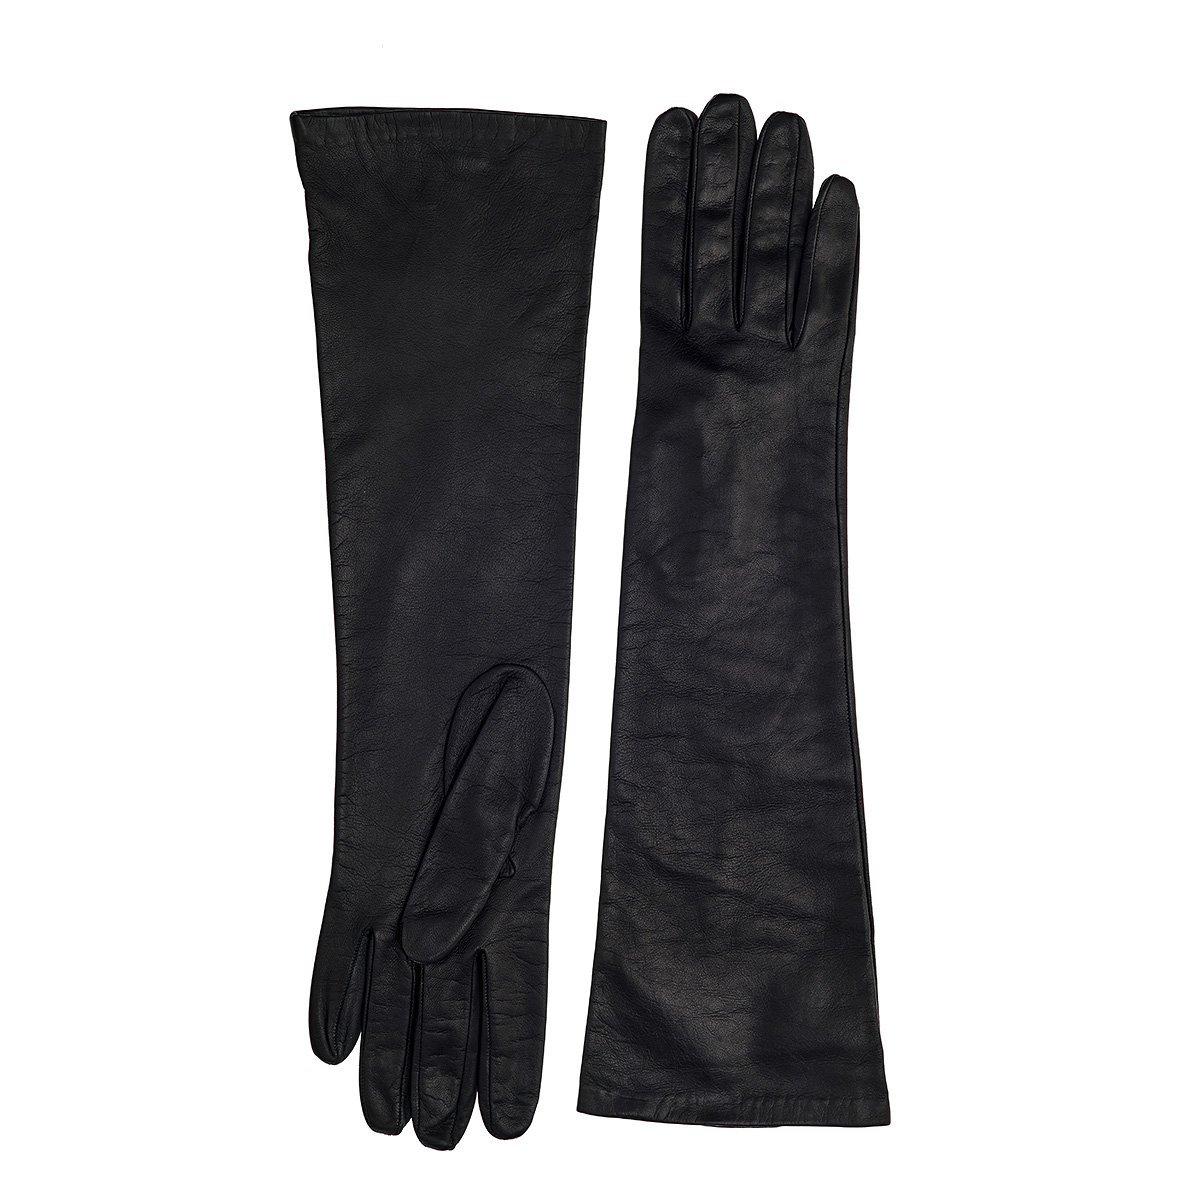 Silk Lined Long Black or White Leather Gloves (BLACK - LARGE)